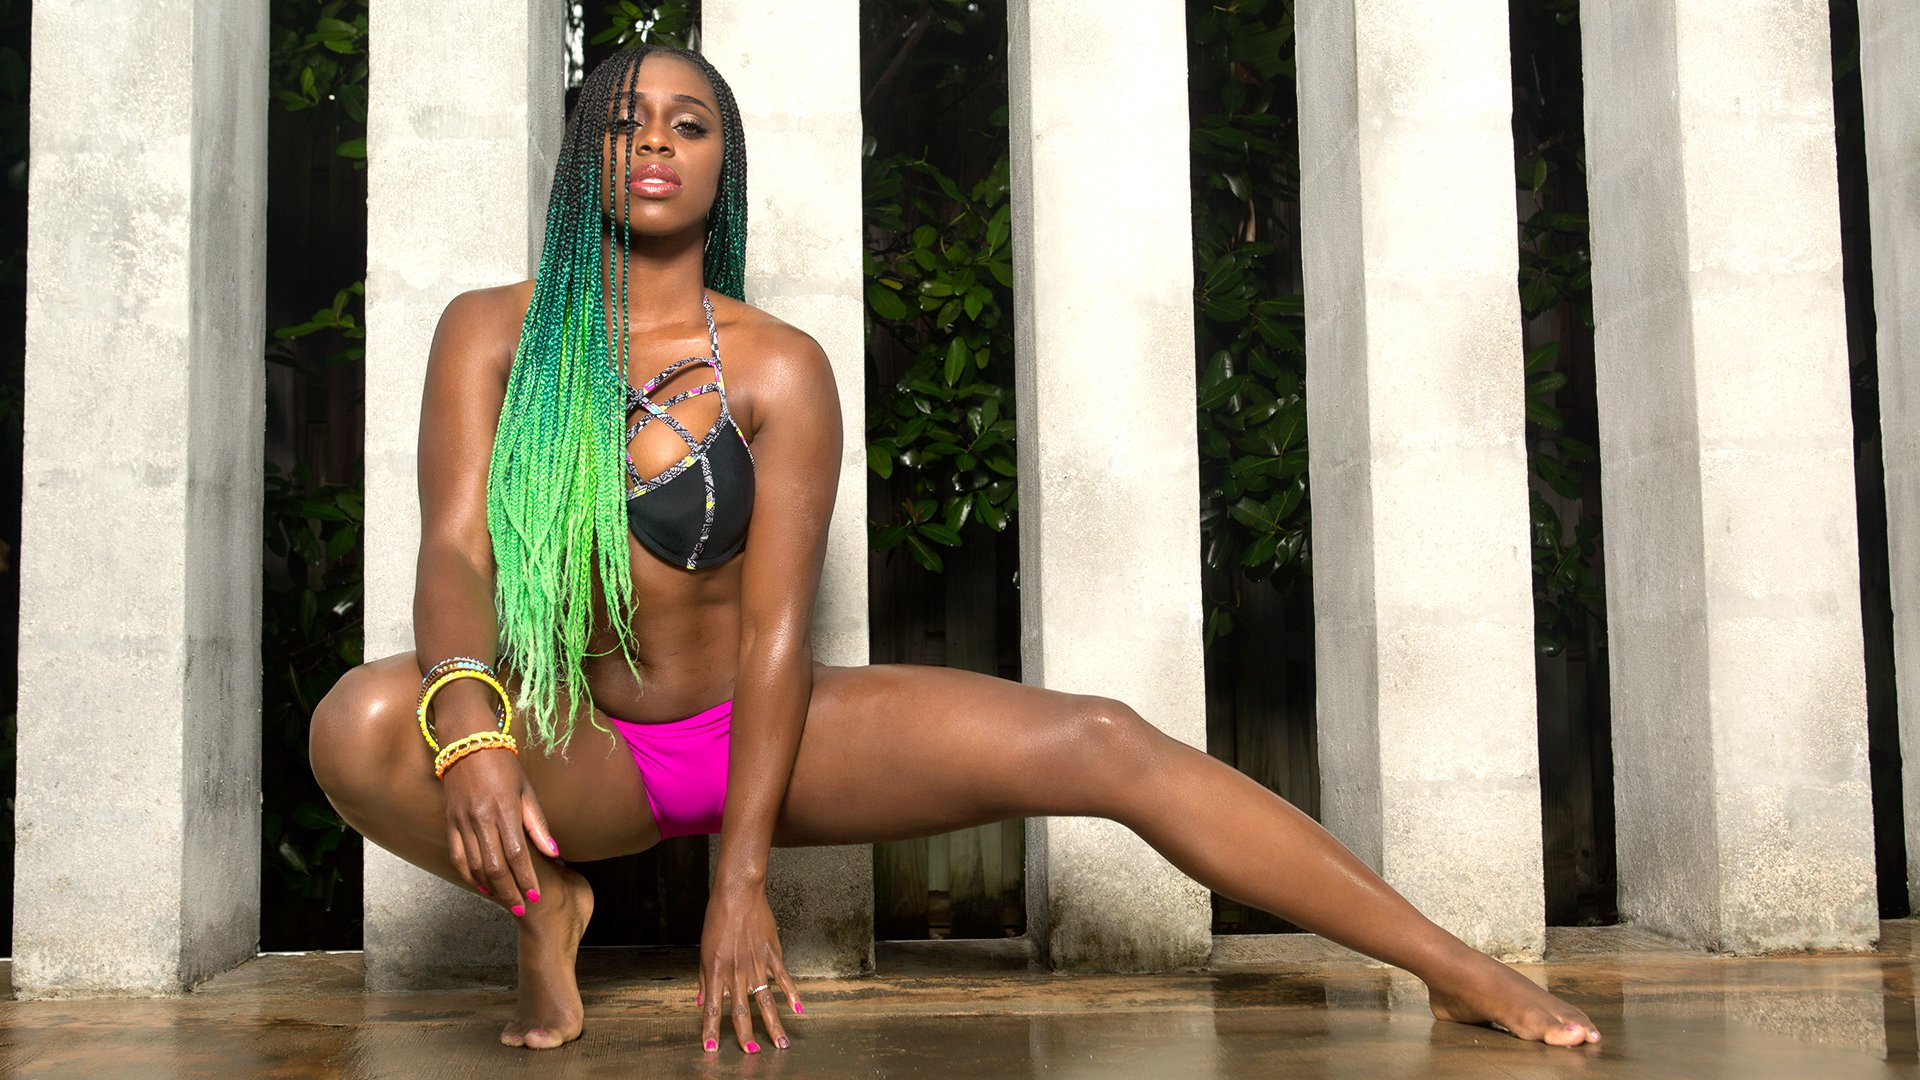 HOTTEST DIVAS: 50 Greatest Bikini Photos Ever - WWE.com